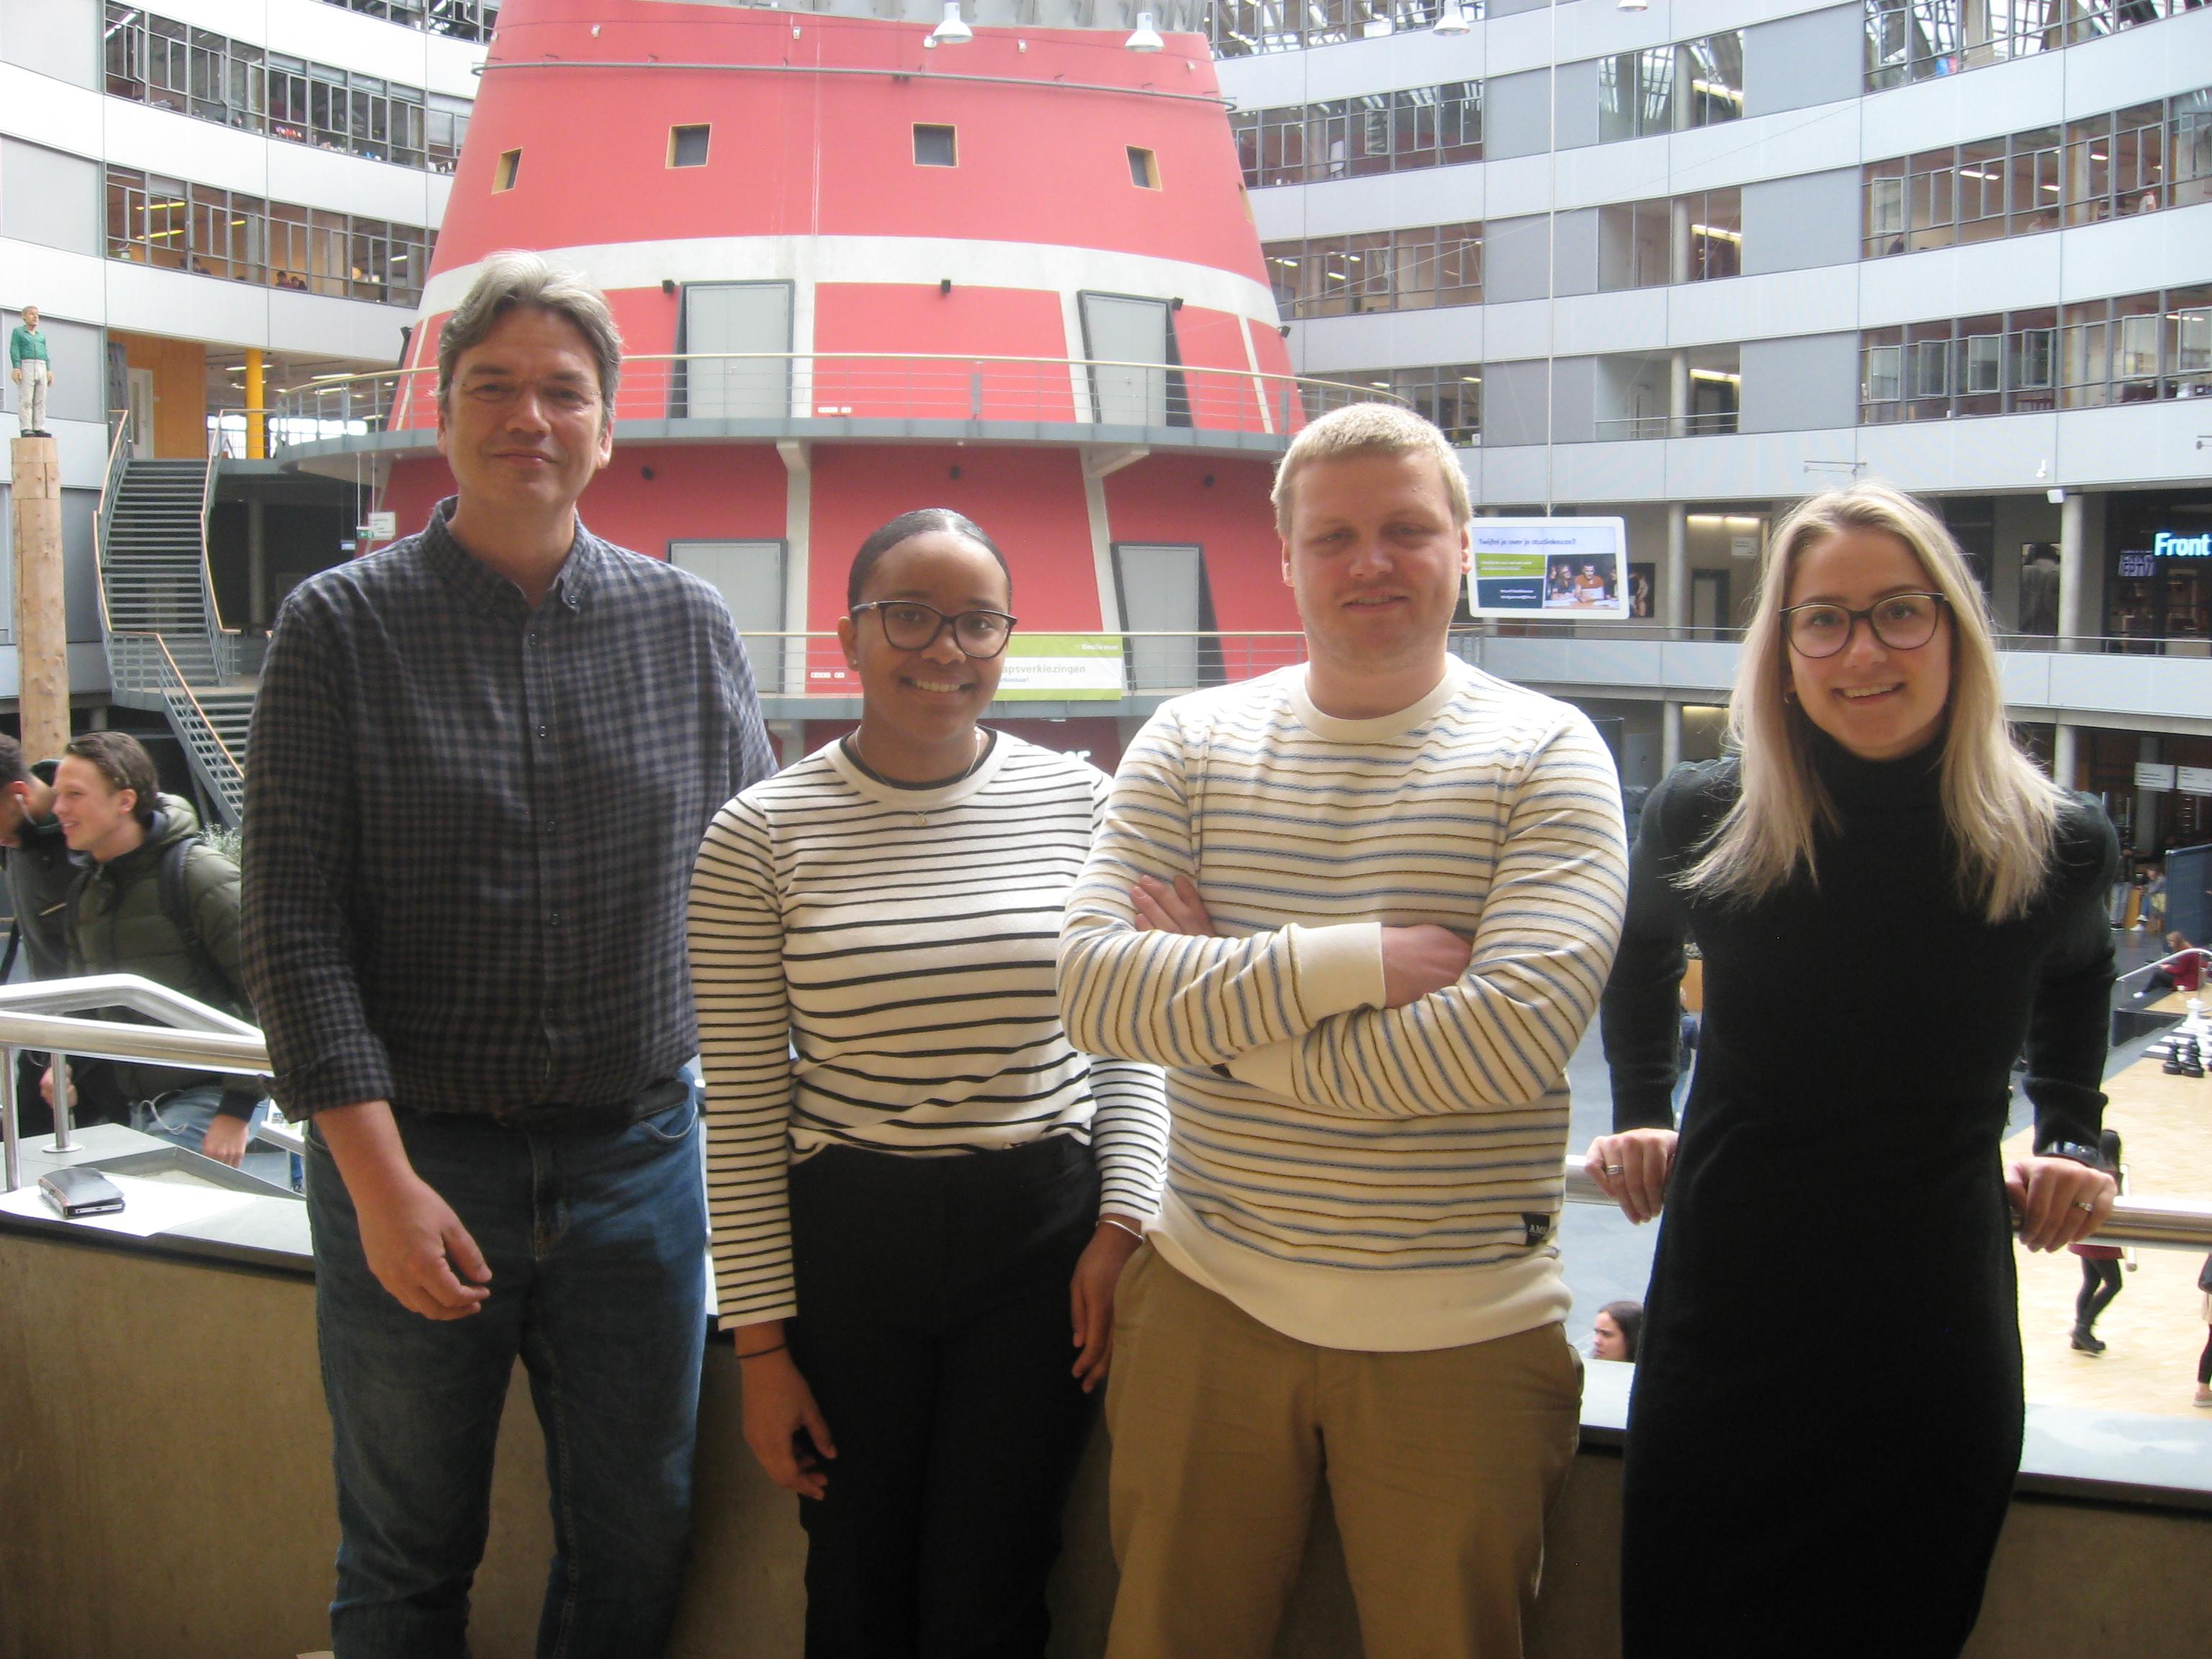 Interview: Haagse Hogeschool